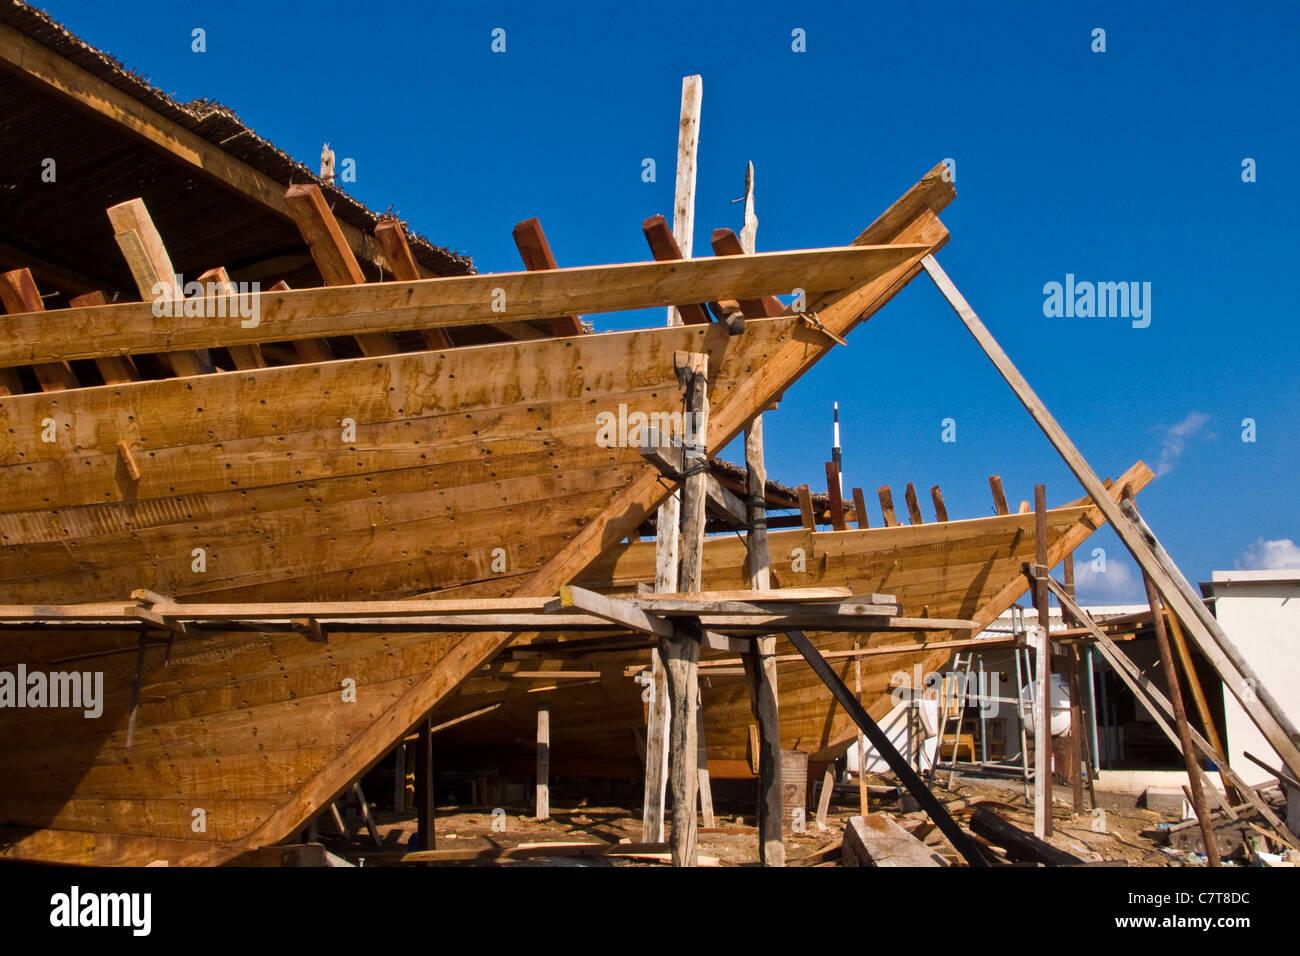 Oman, Sur, dhow shipyard - Stock Image